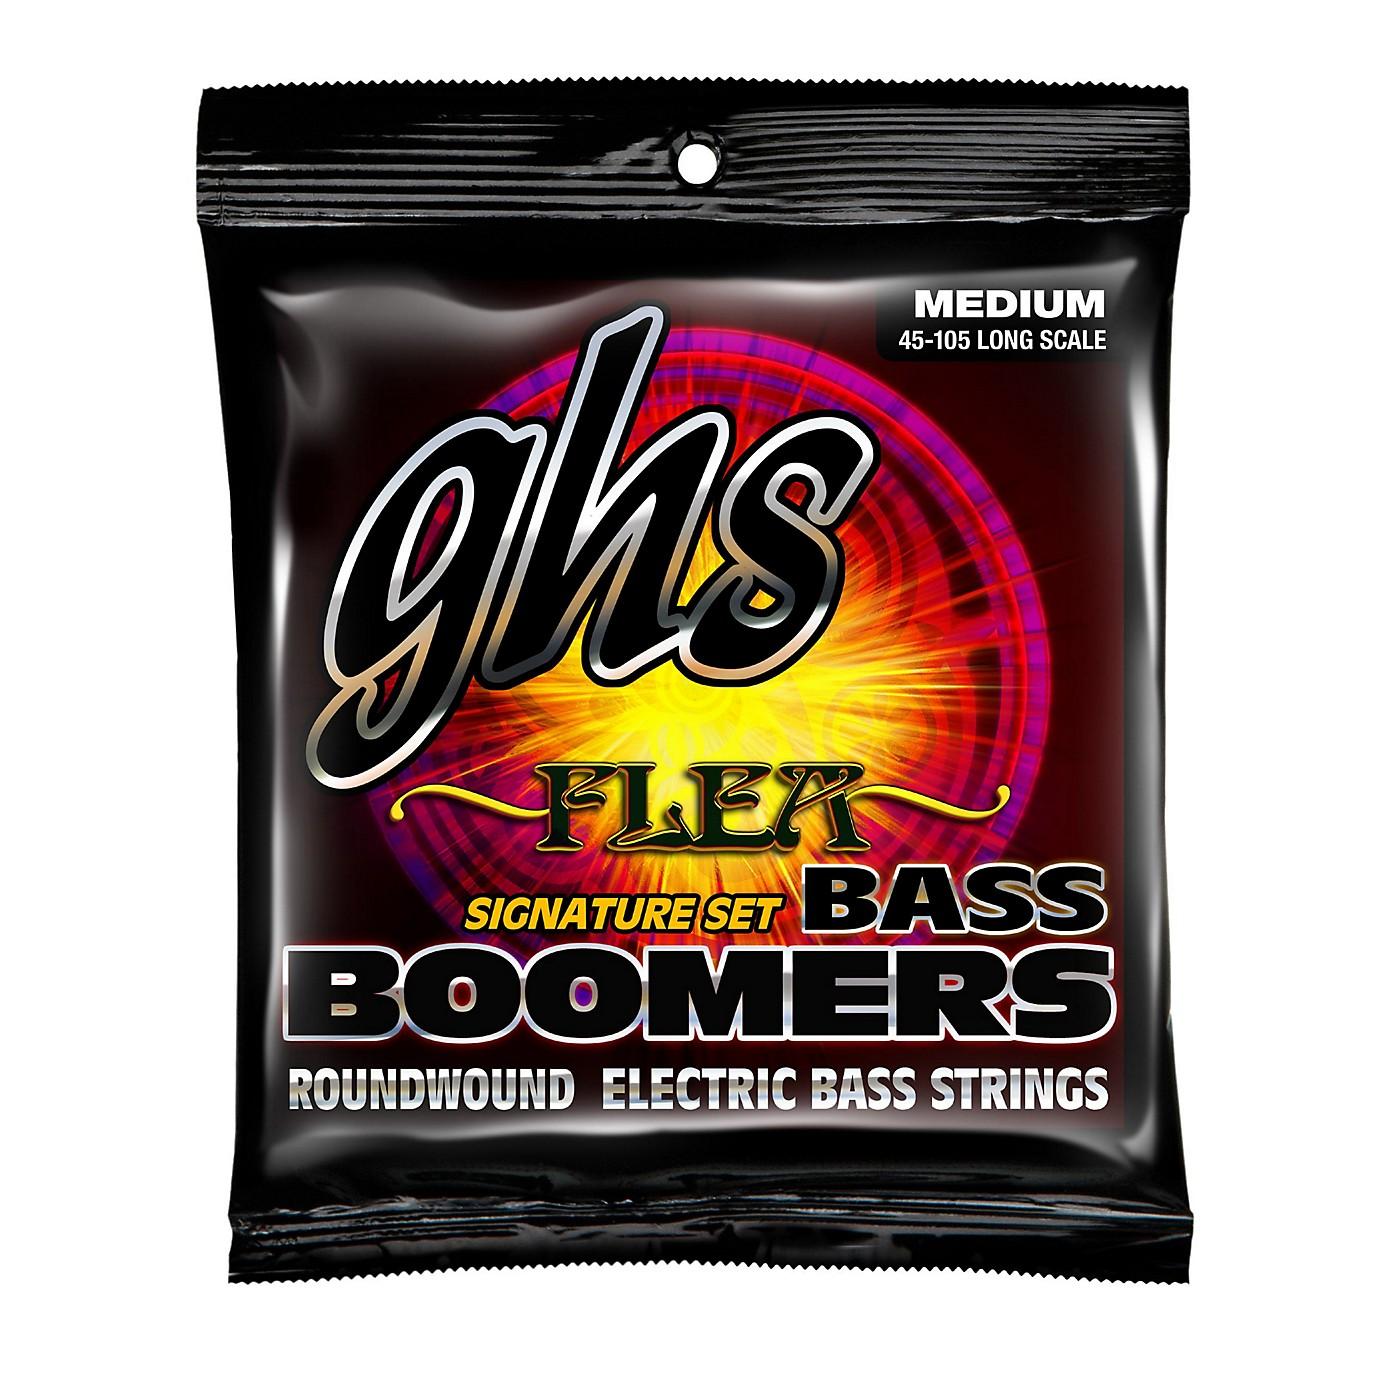 GHS M3045F Flea Signature Bass Boomers Medium Electric Bass Strings thumbnail